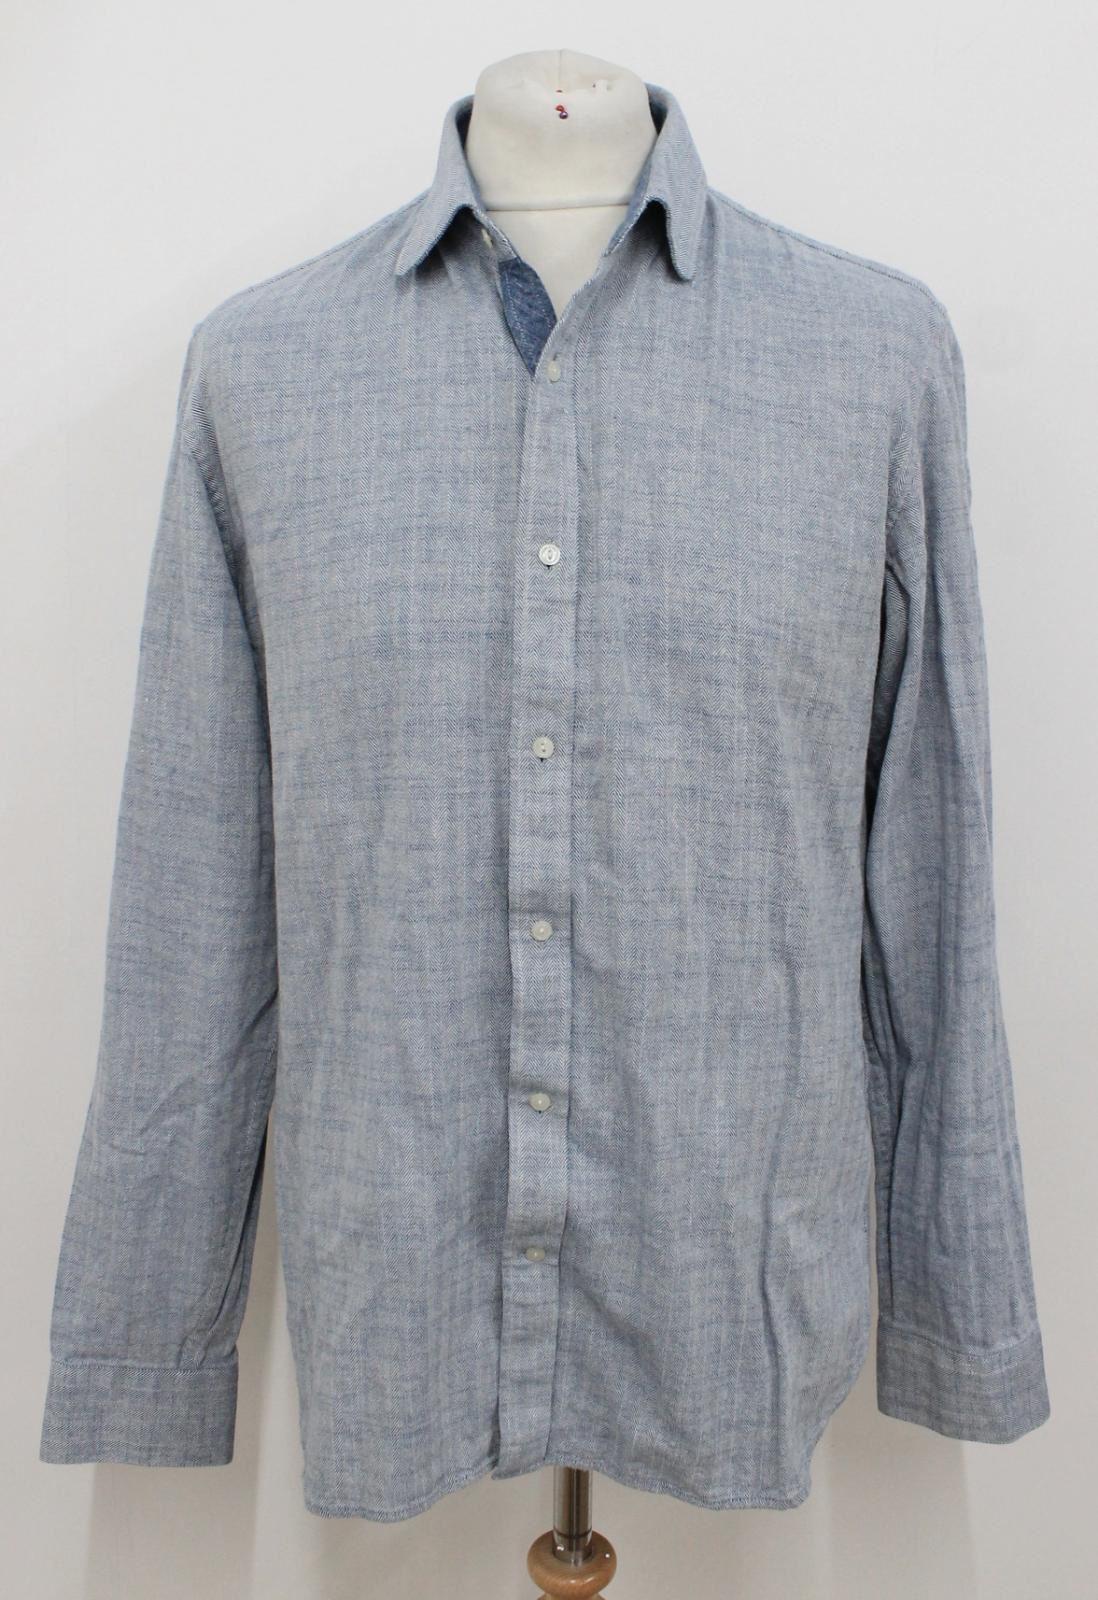 REISS Men's Light bluee Lines Pattern Cotton Long Sleeved Casual Shirt Size XL